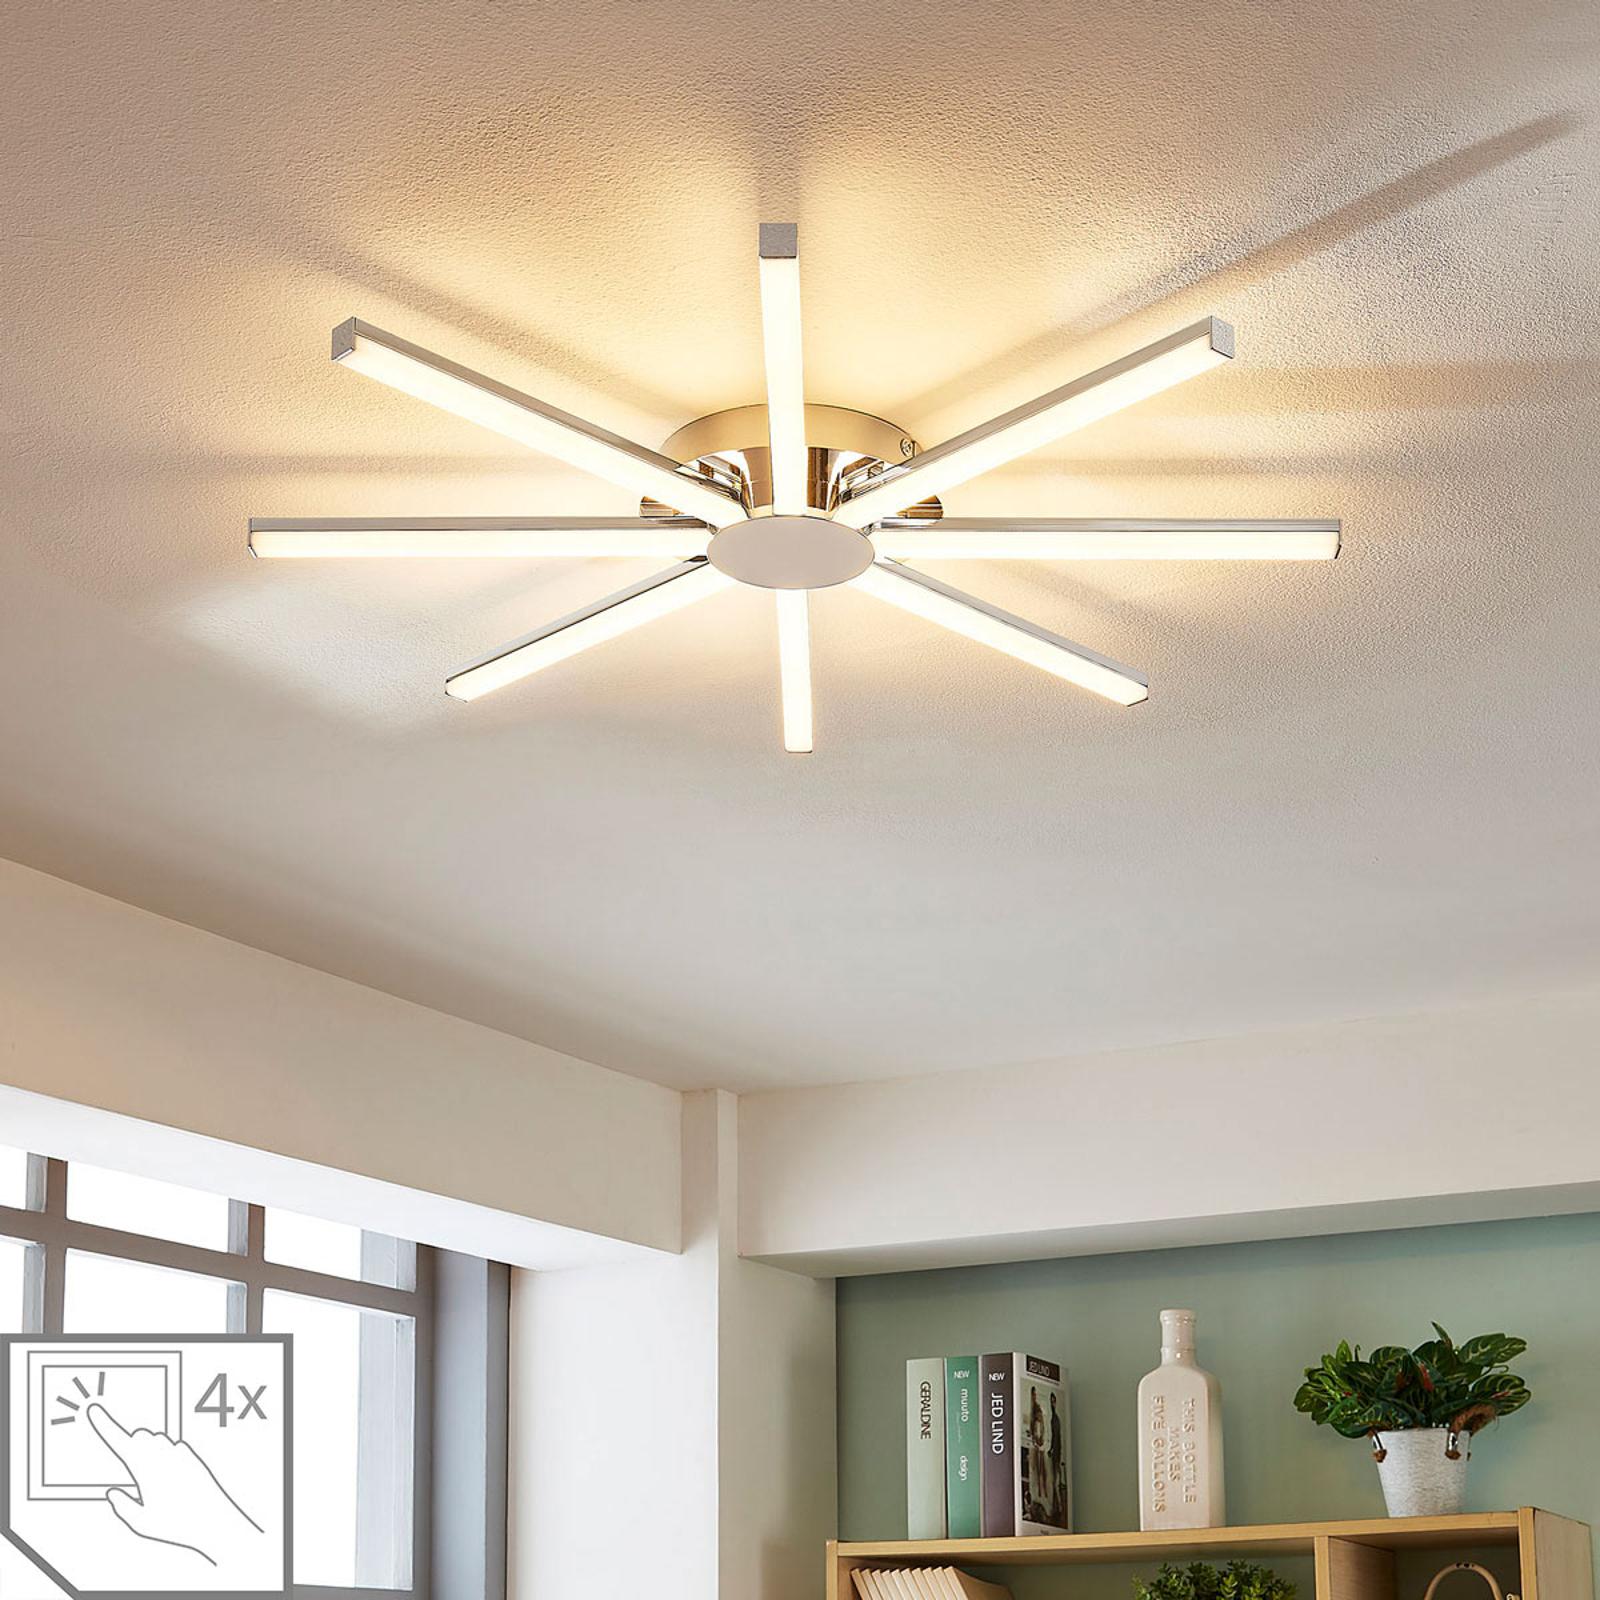 Plafonnier LED en forme de soleil Korona, dimmable